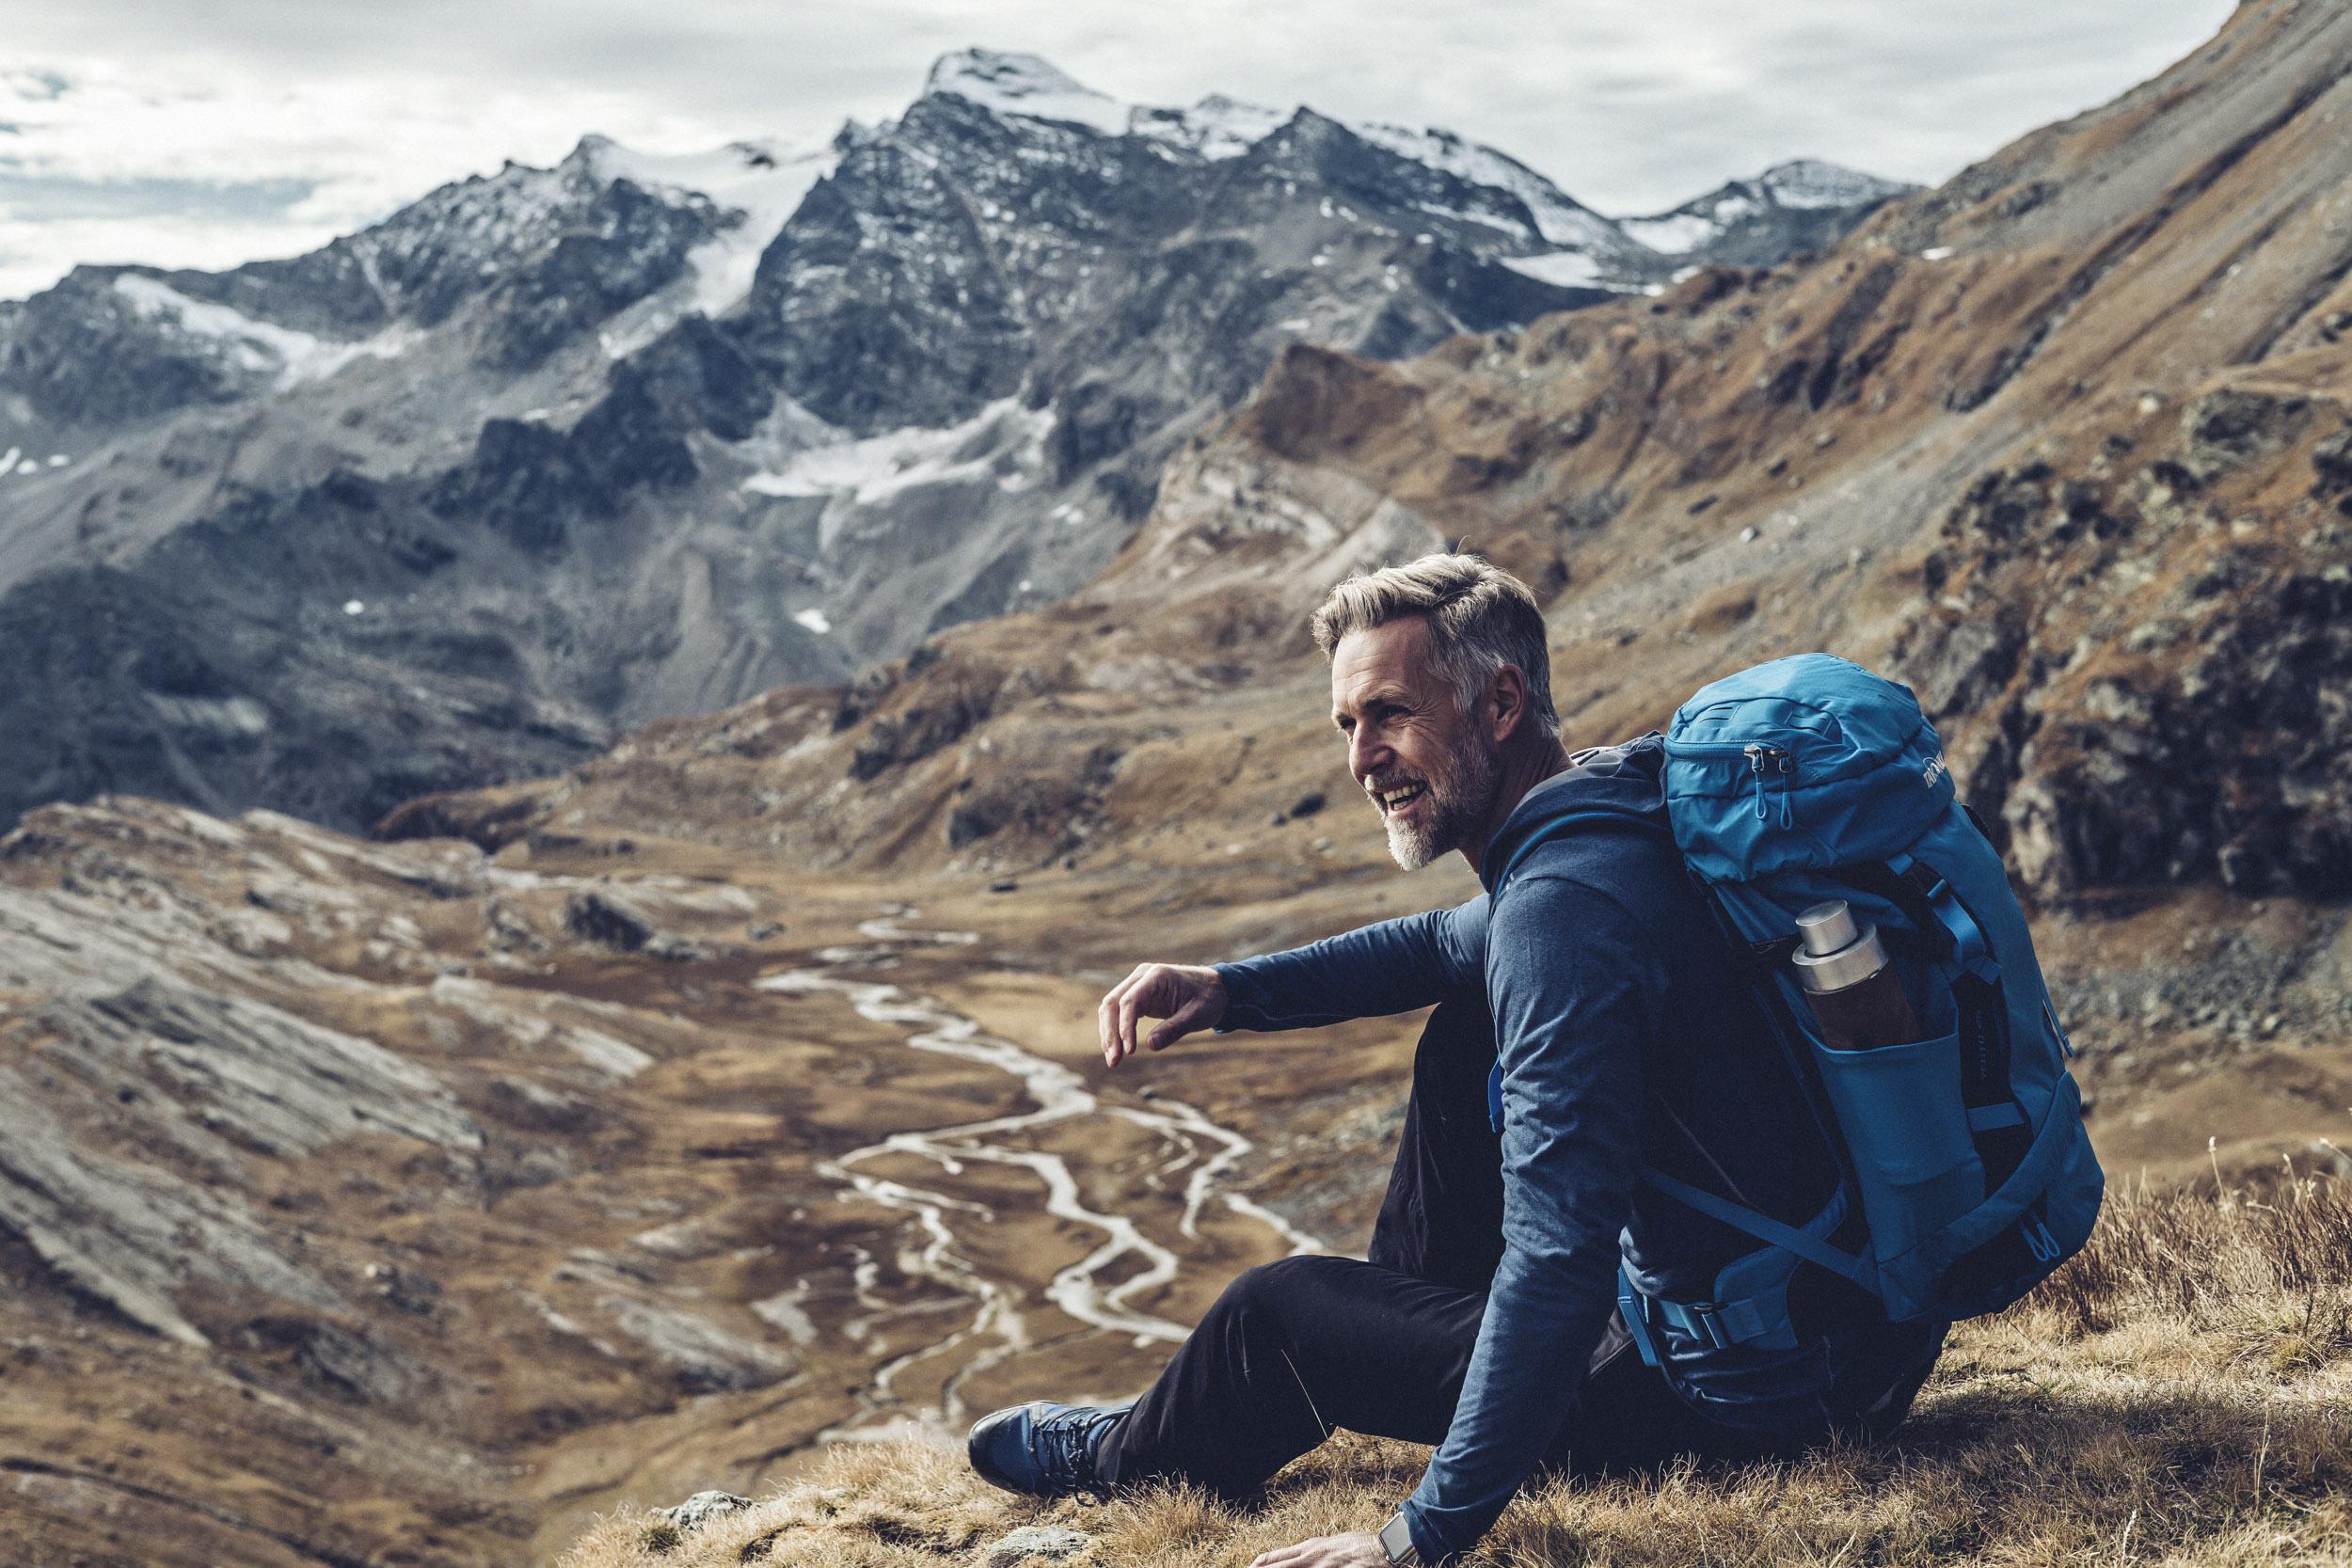 2019-SeifertUebler-luqel-outdoor-mountain-lifestyle010.jpg